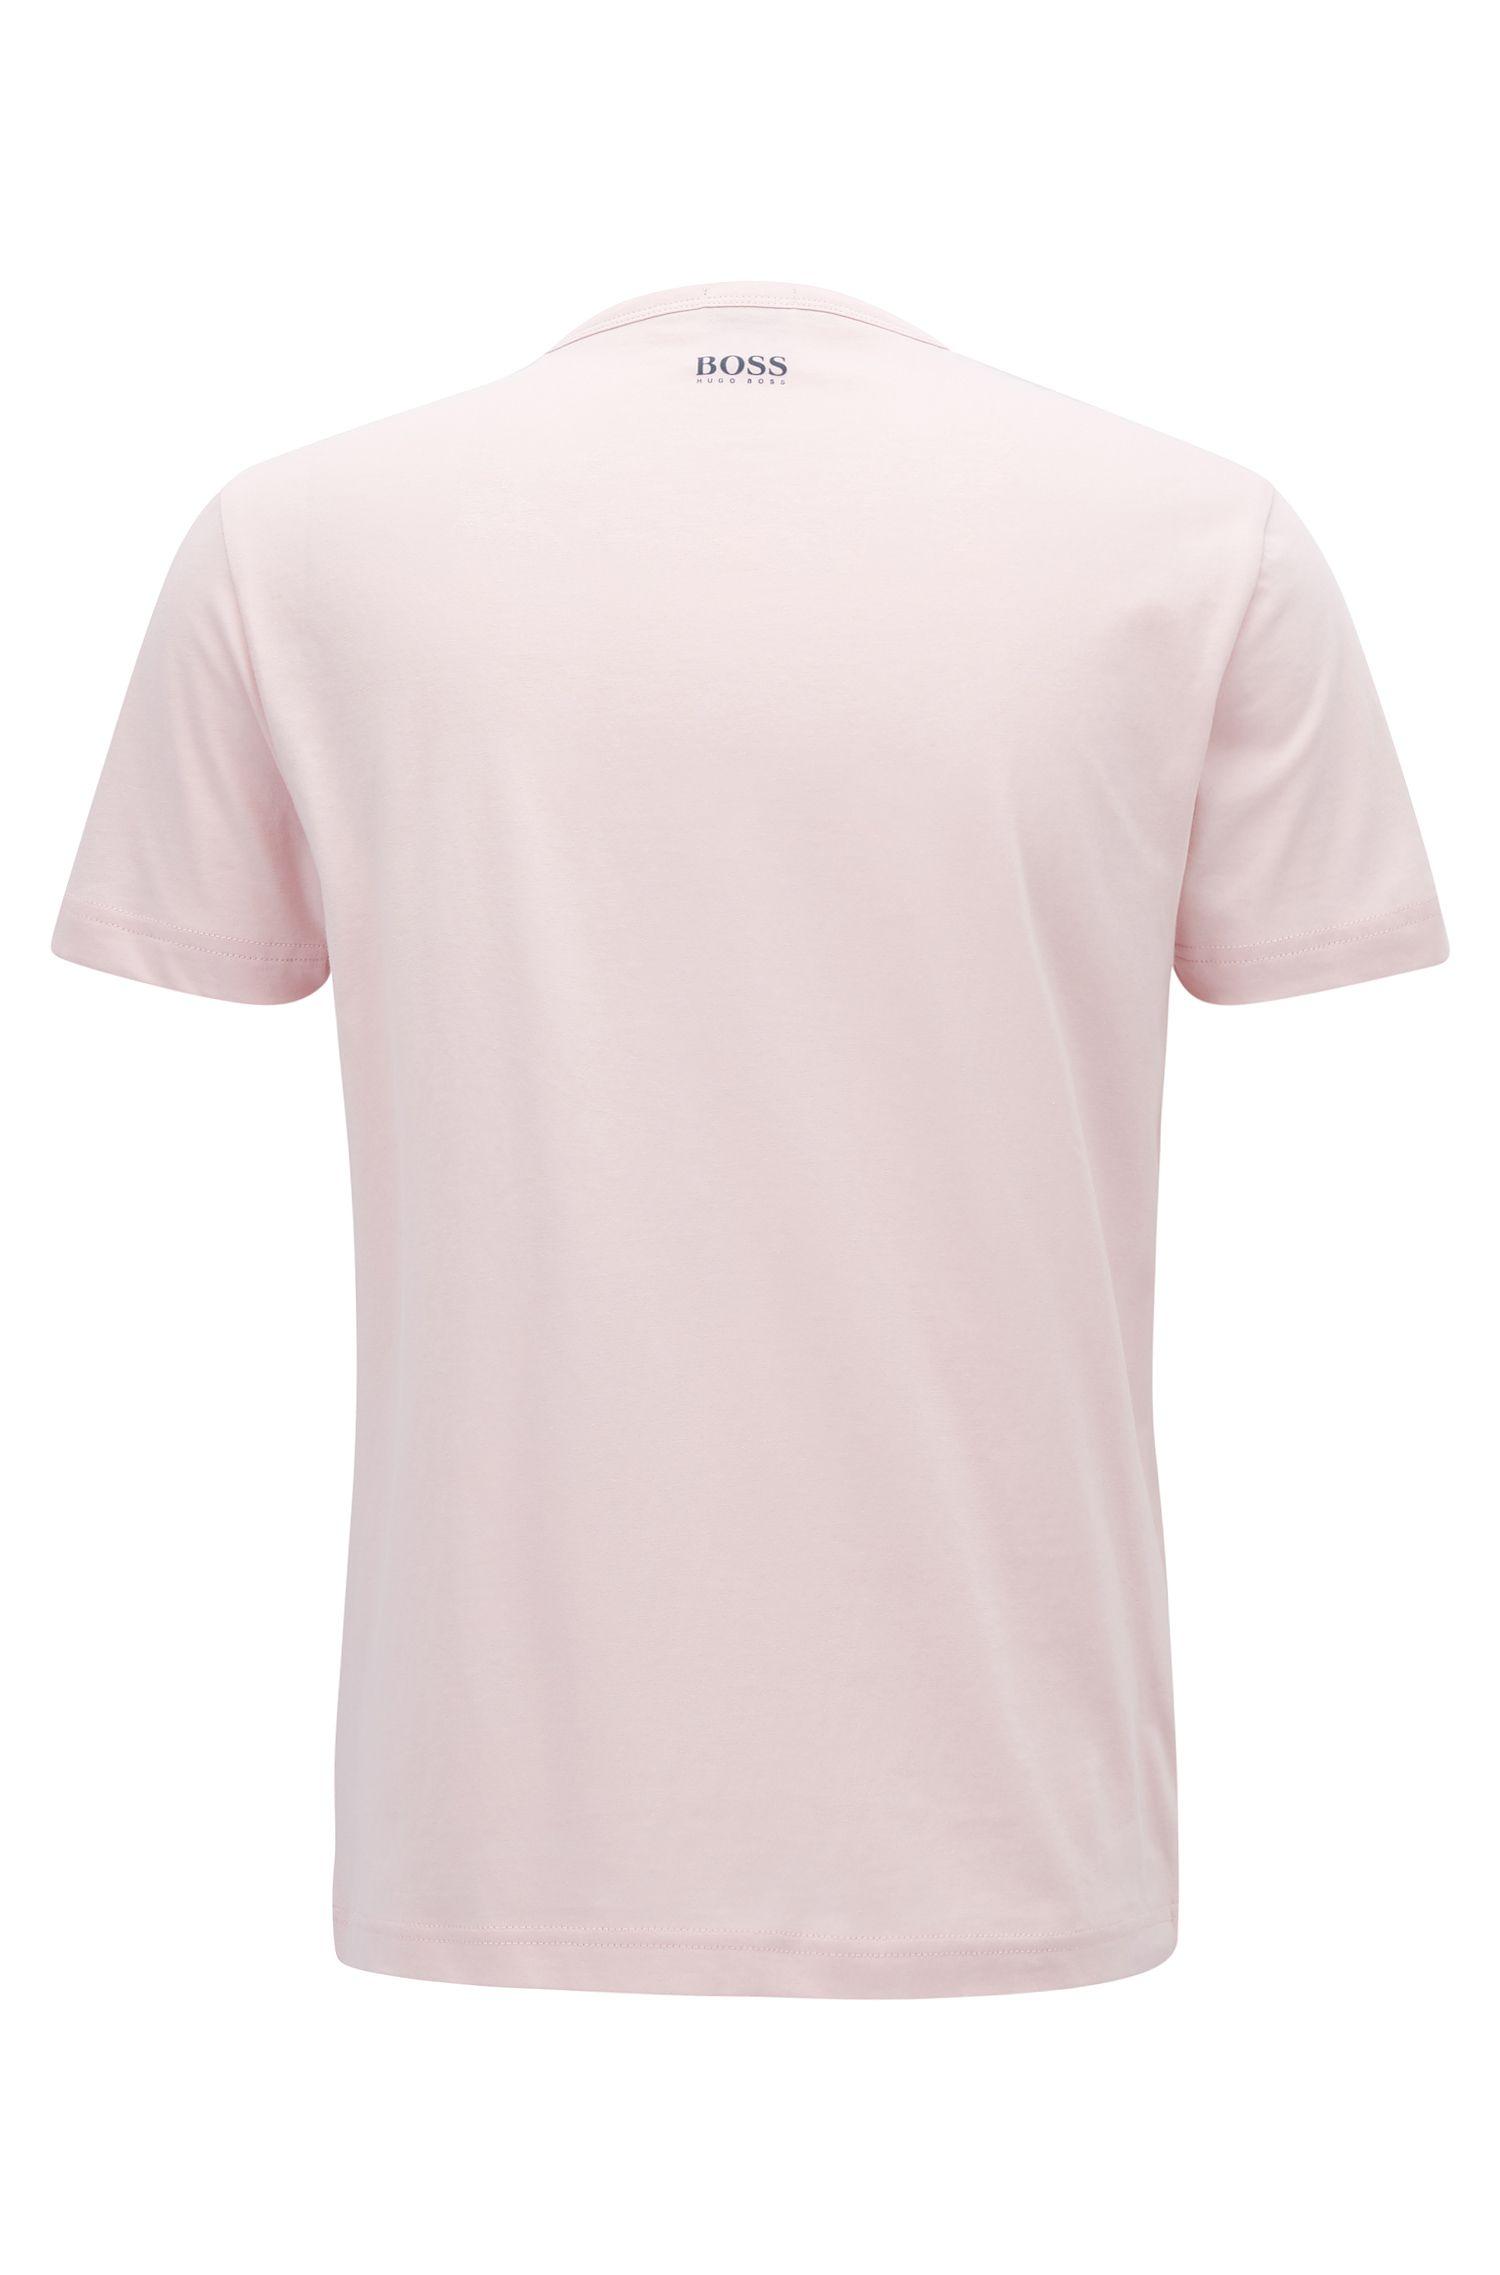 Logo Cotton Graphic T-Shirt | Tee